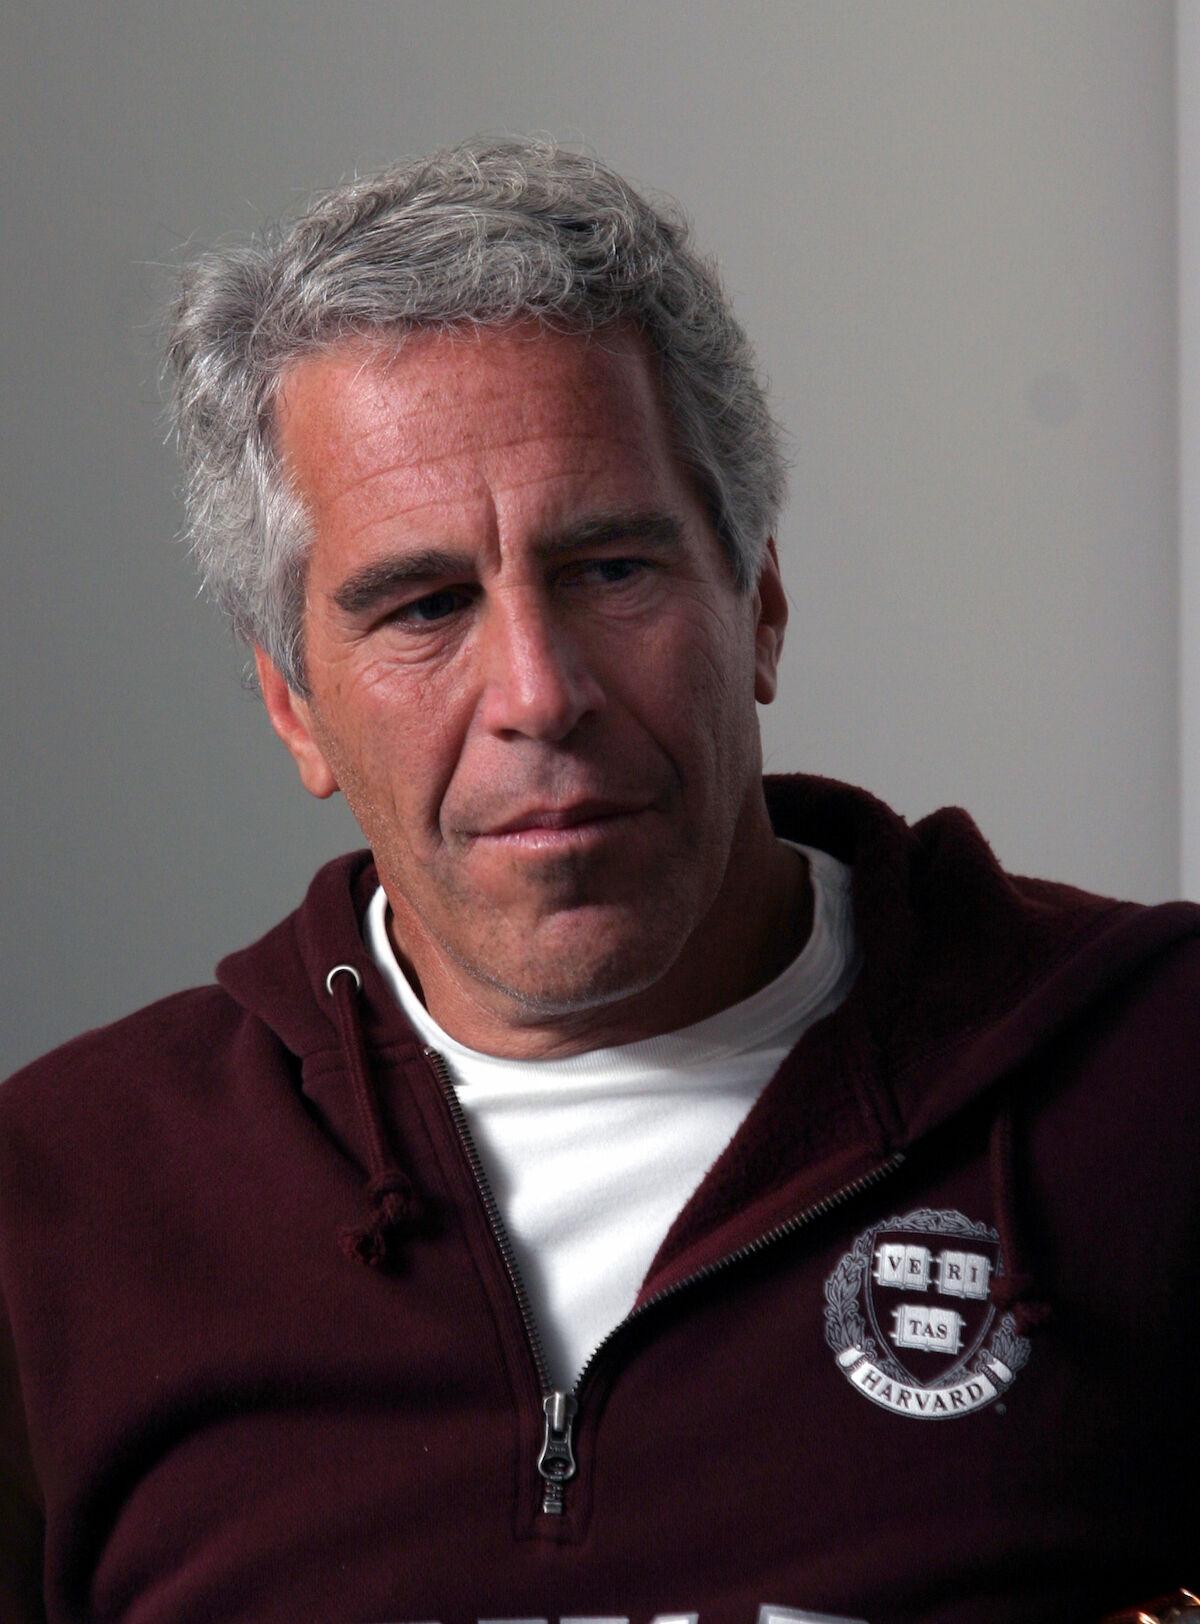 Jeffrey Epstein. Photo Rick Friedman/Rick Friedman Photography/Corbis via Getty Images.